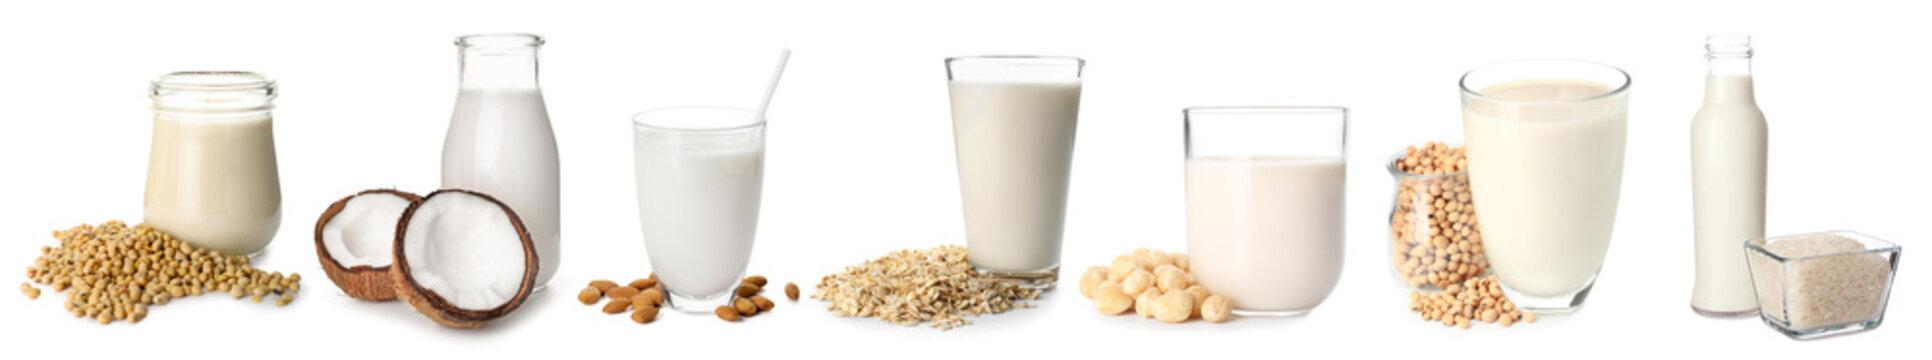 Different vegan milks on white background